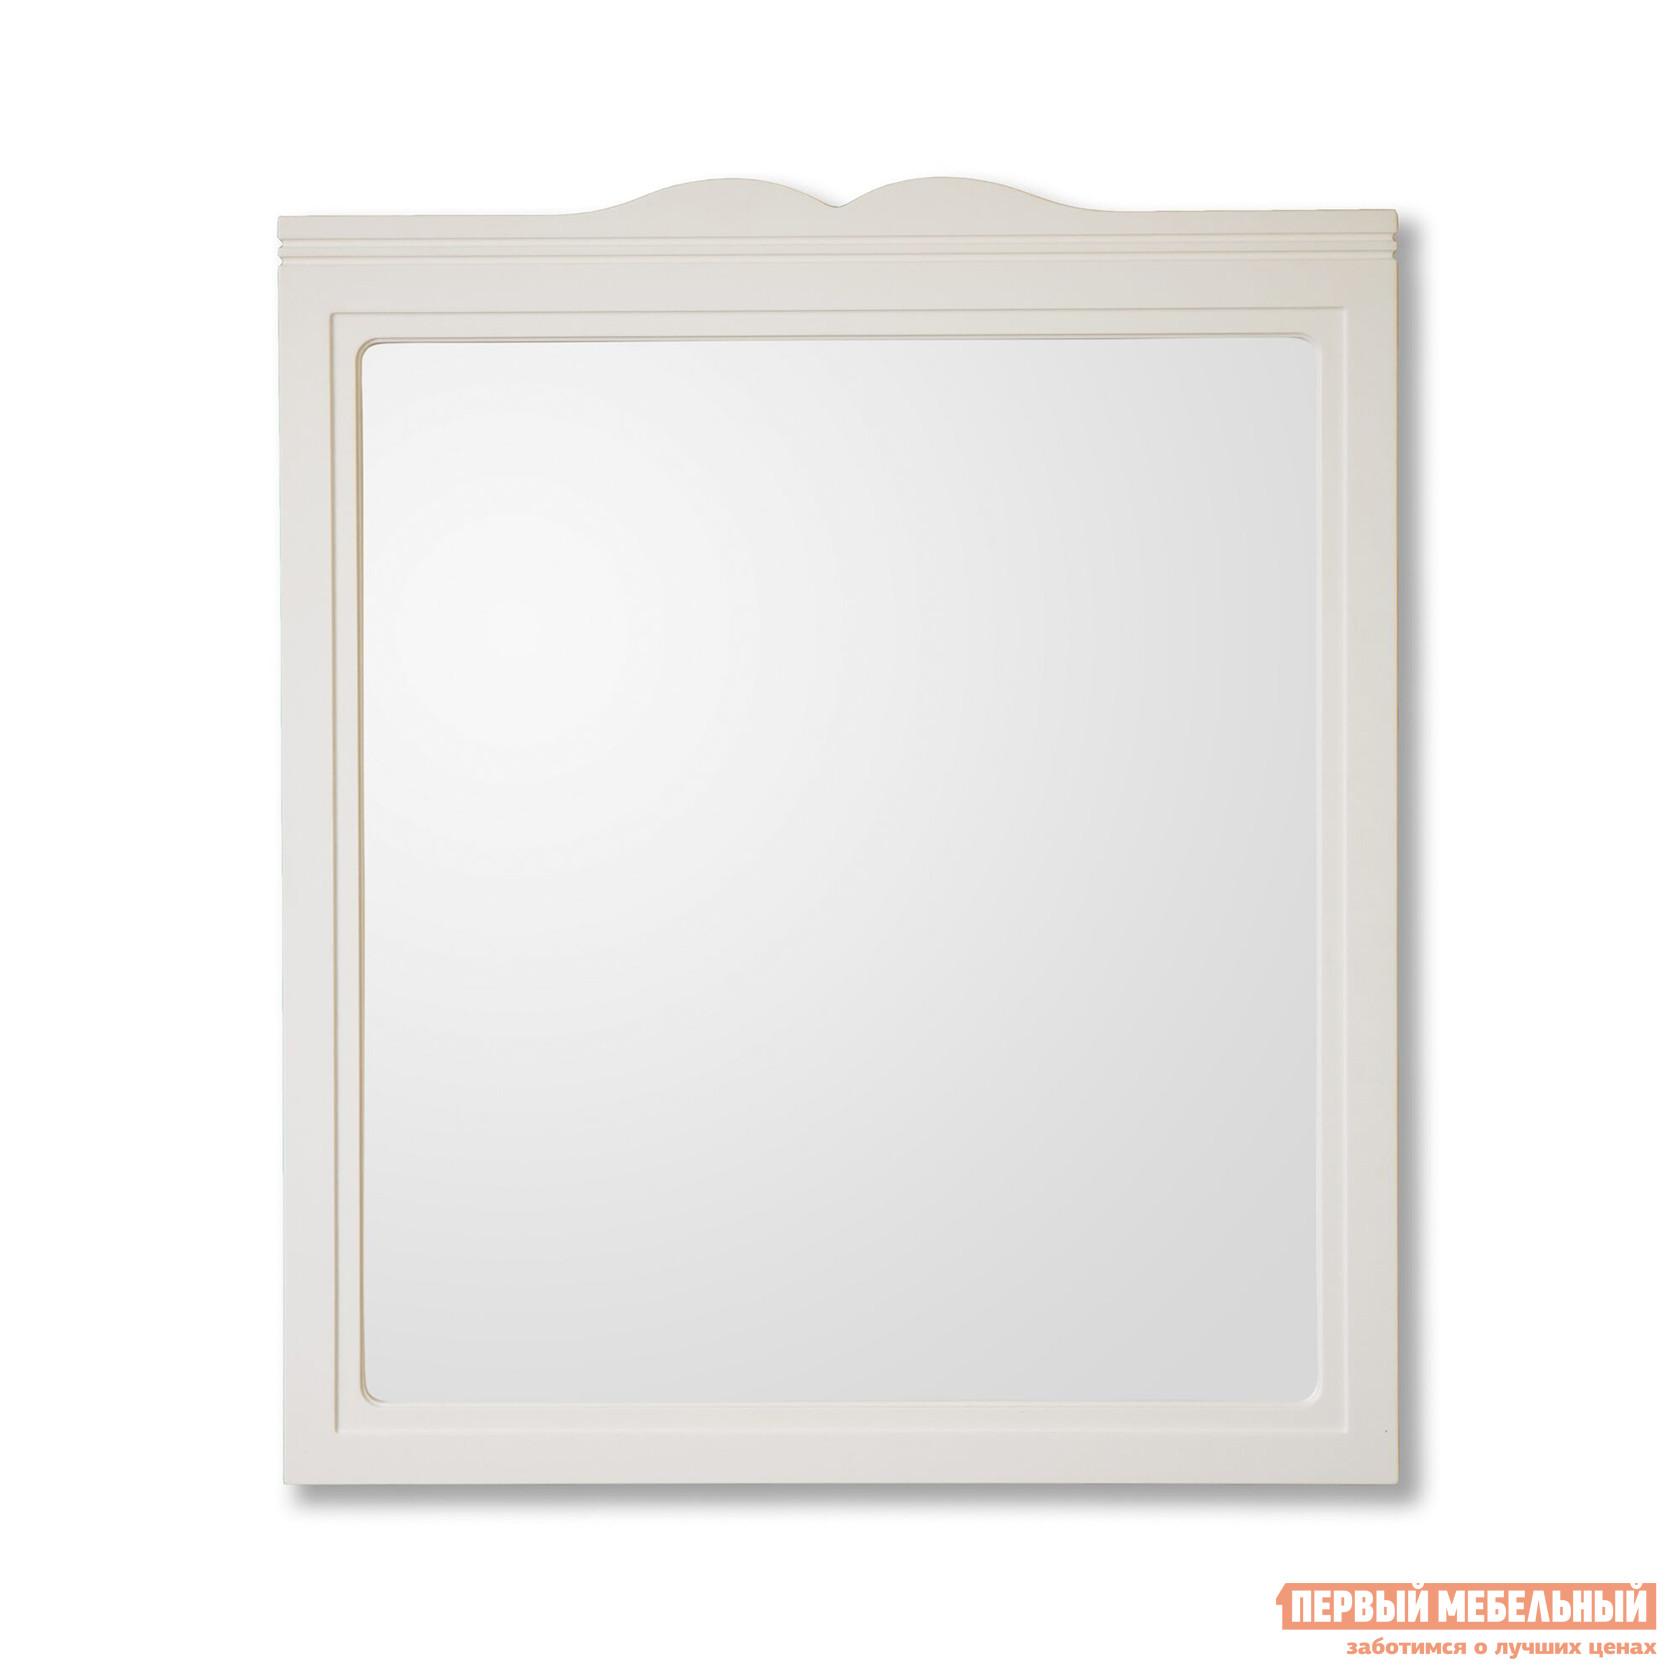 Настенное зеркало Паоли PAOLI Provence Зеркало 80 зеркало интерьерное дом корлеоне зеркало настенное мозаика 80 х 80 см